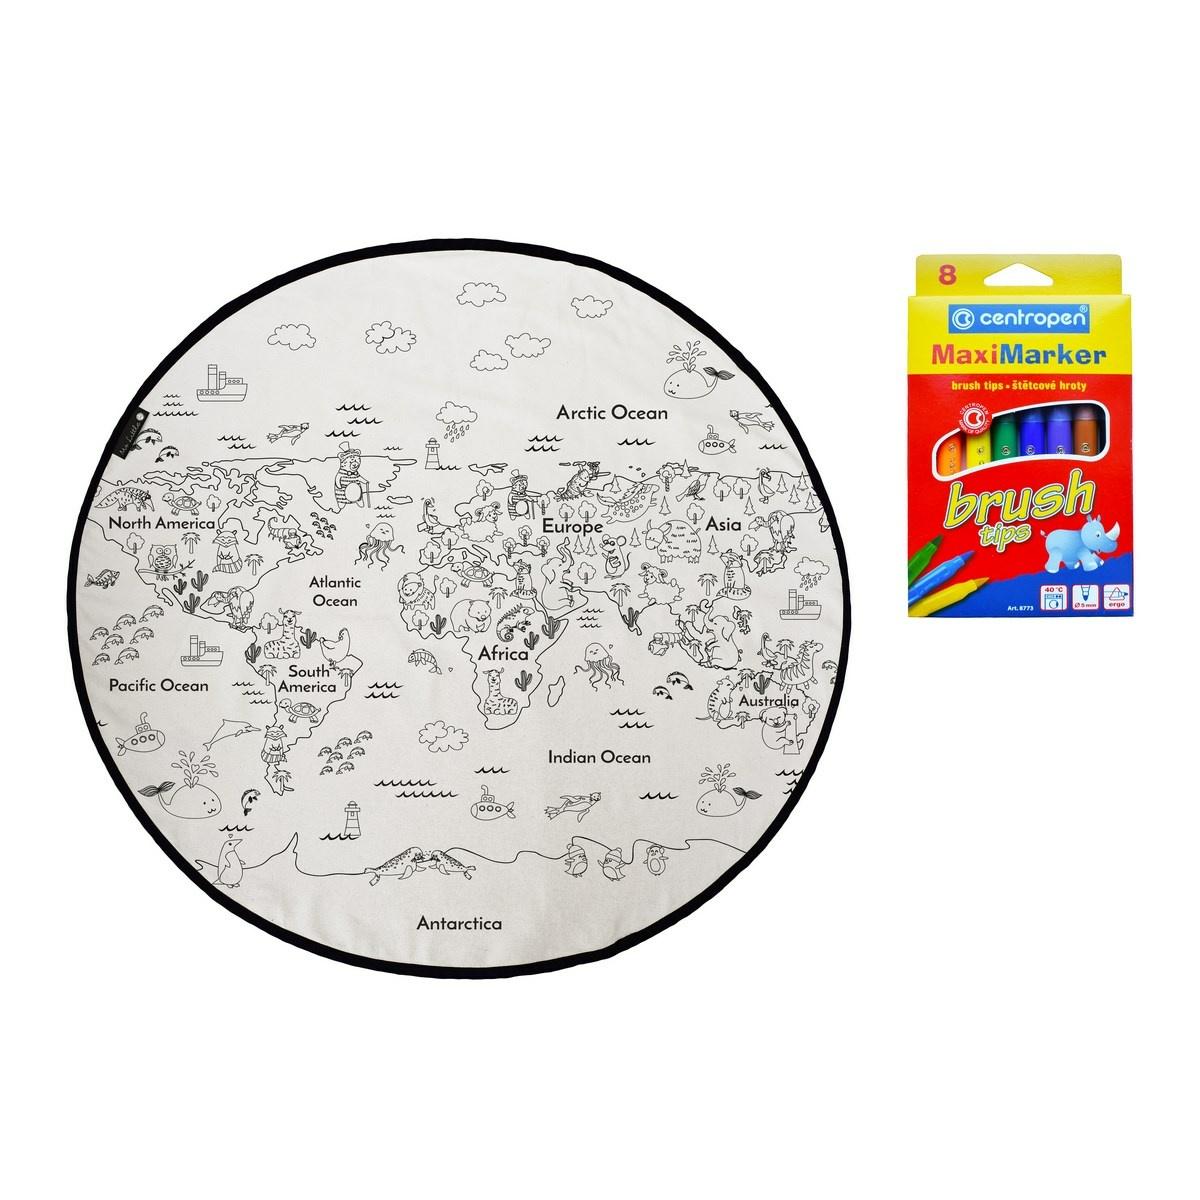 Butter Kings Detská hracia podložka Colouring world, 130 cm